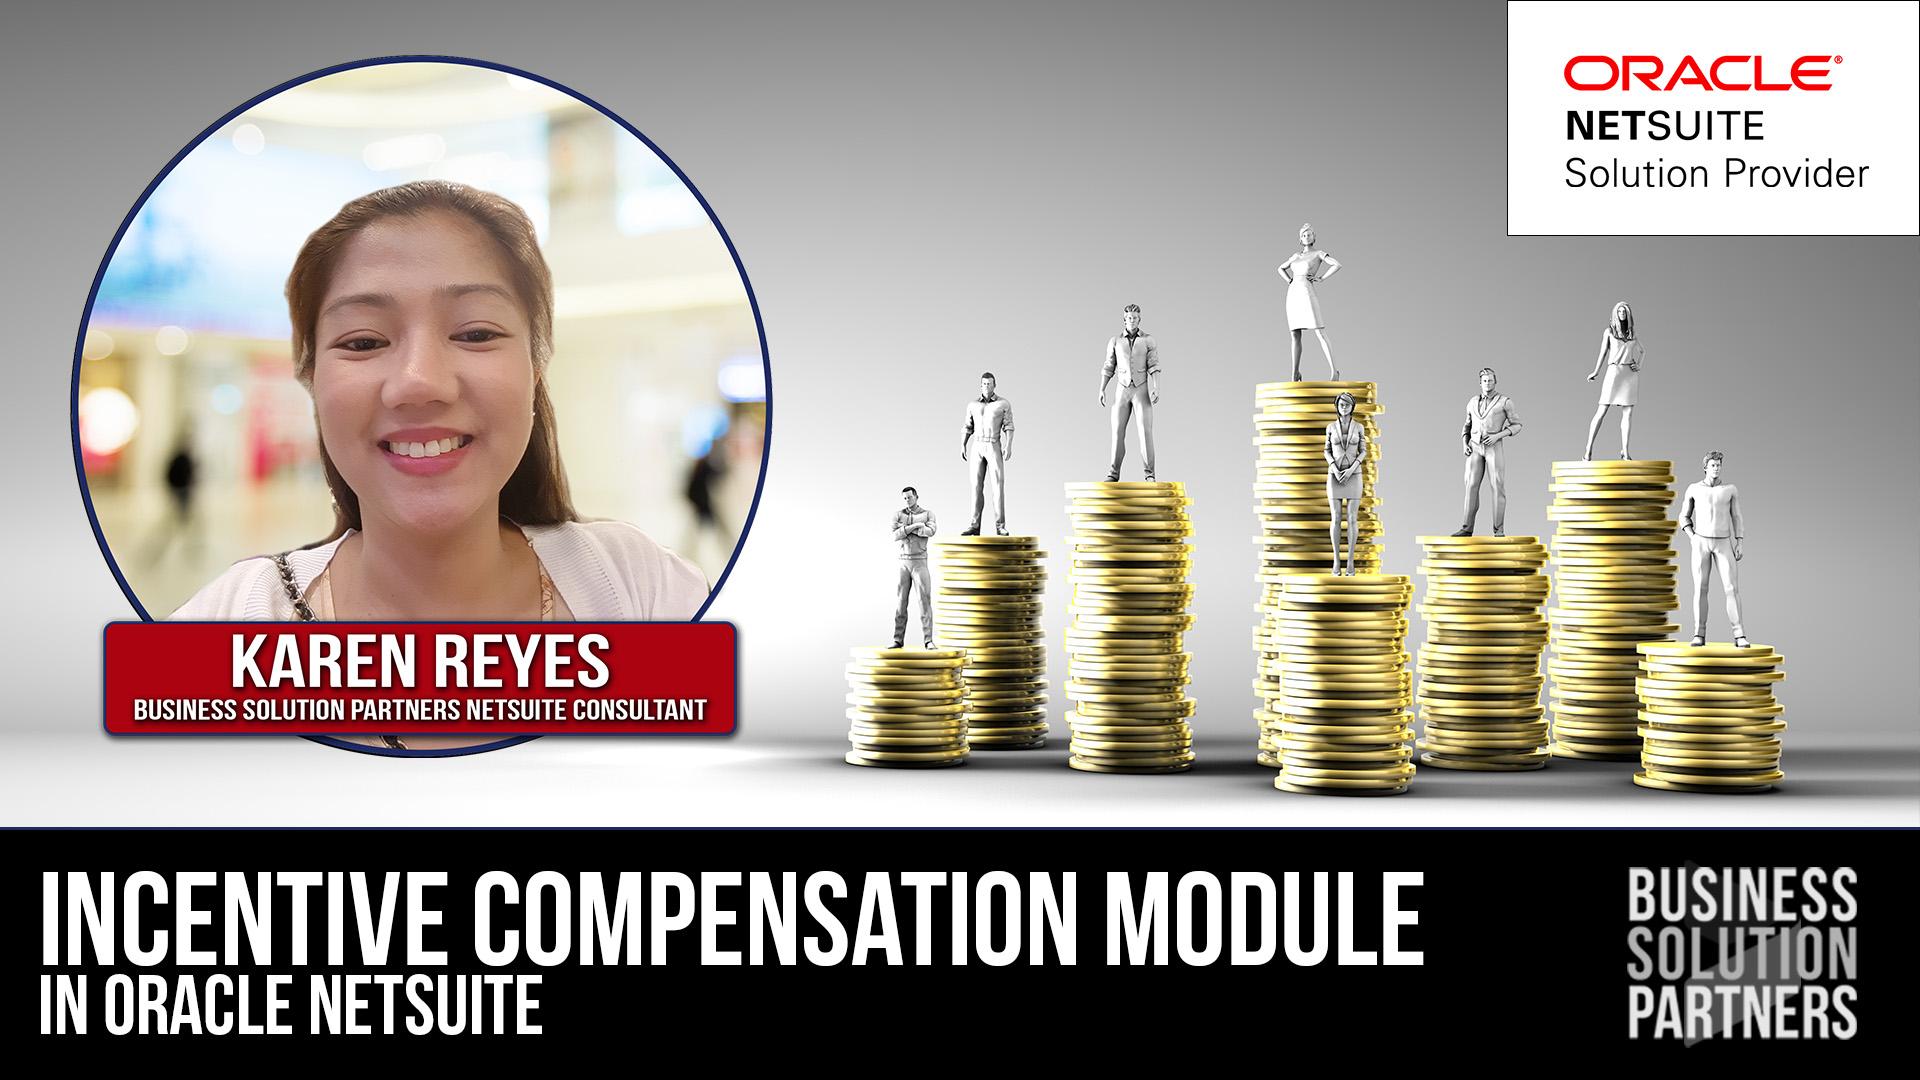 Exploring NetSuite: The Incentive Compensation Module